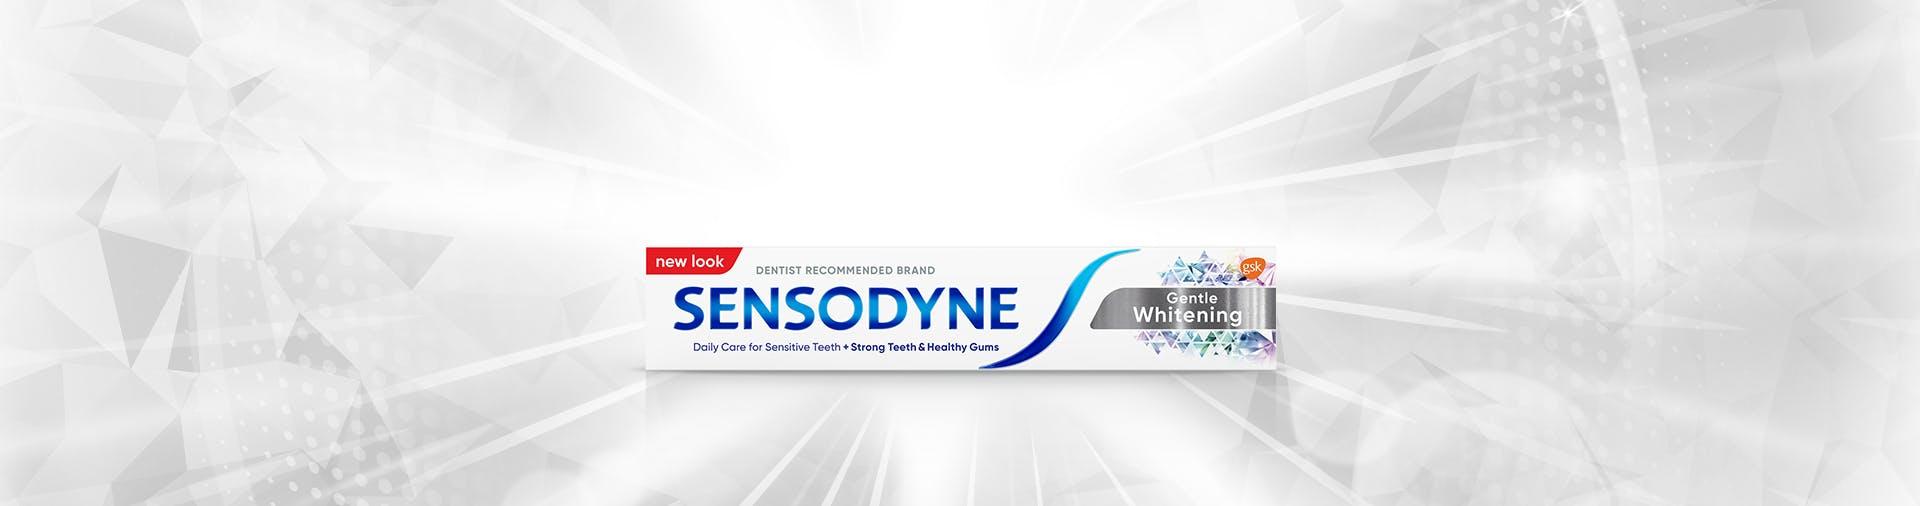 Sensodyne Extra Whitening campaign banner